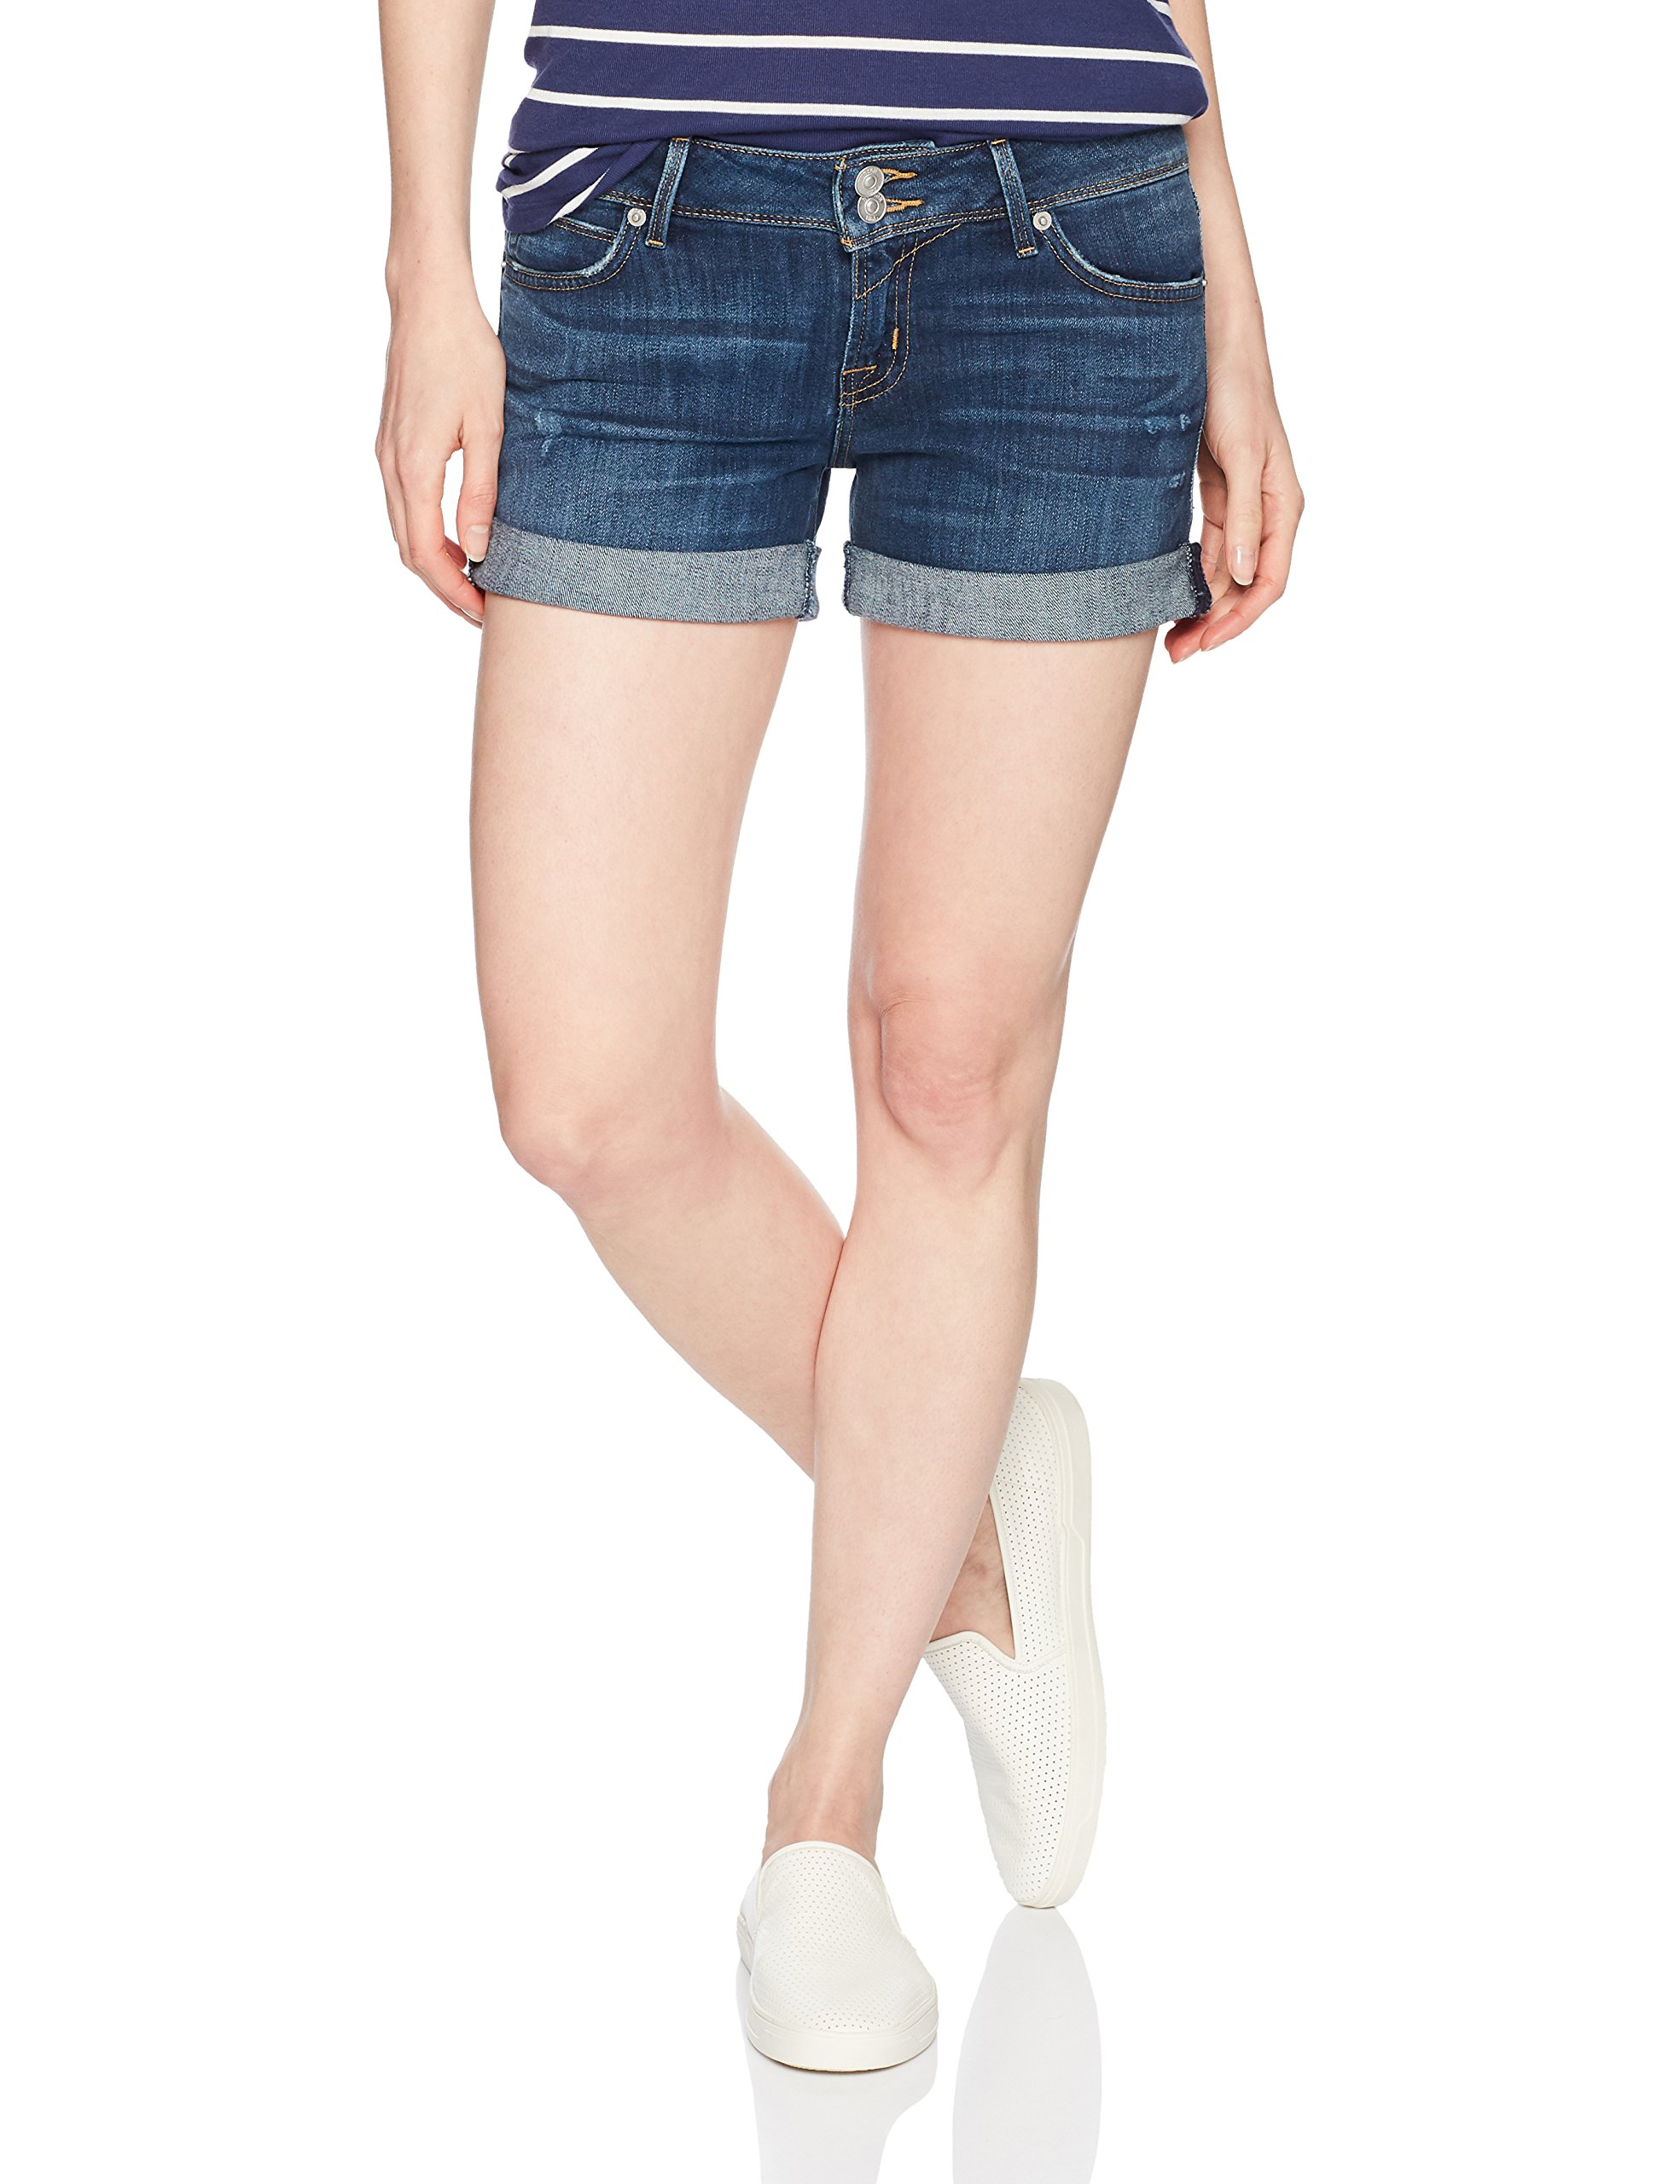 Hudson Jeans Women's Croxley MID Thigh Flap Pocket Jean Short, Double-Deal, 24